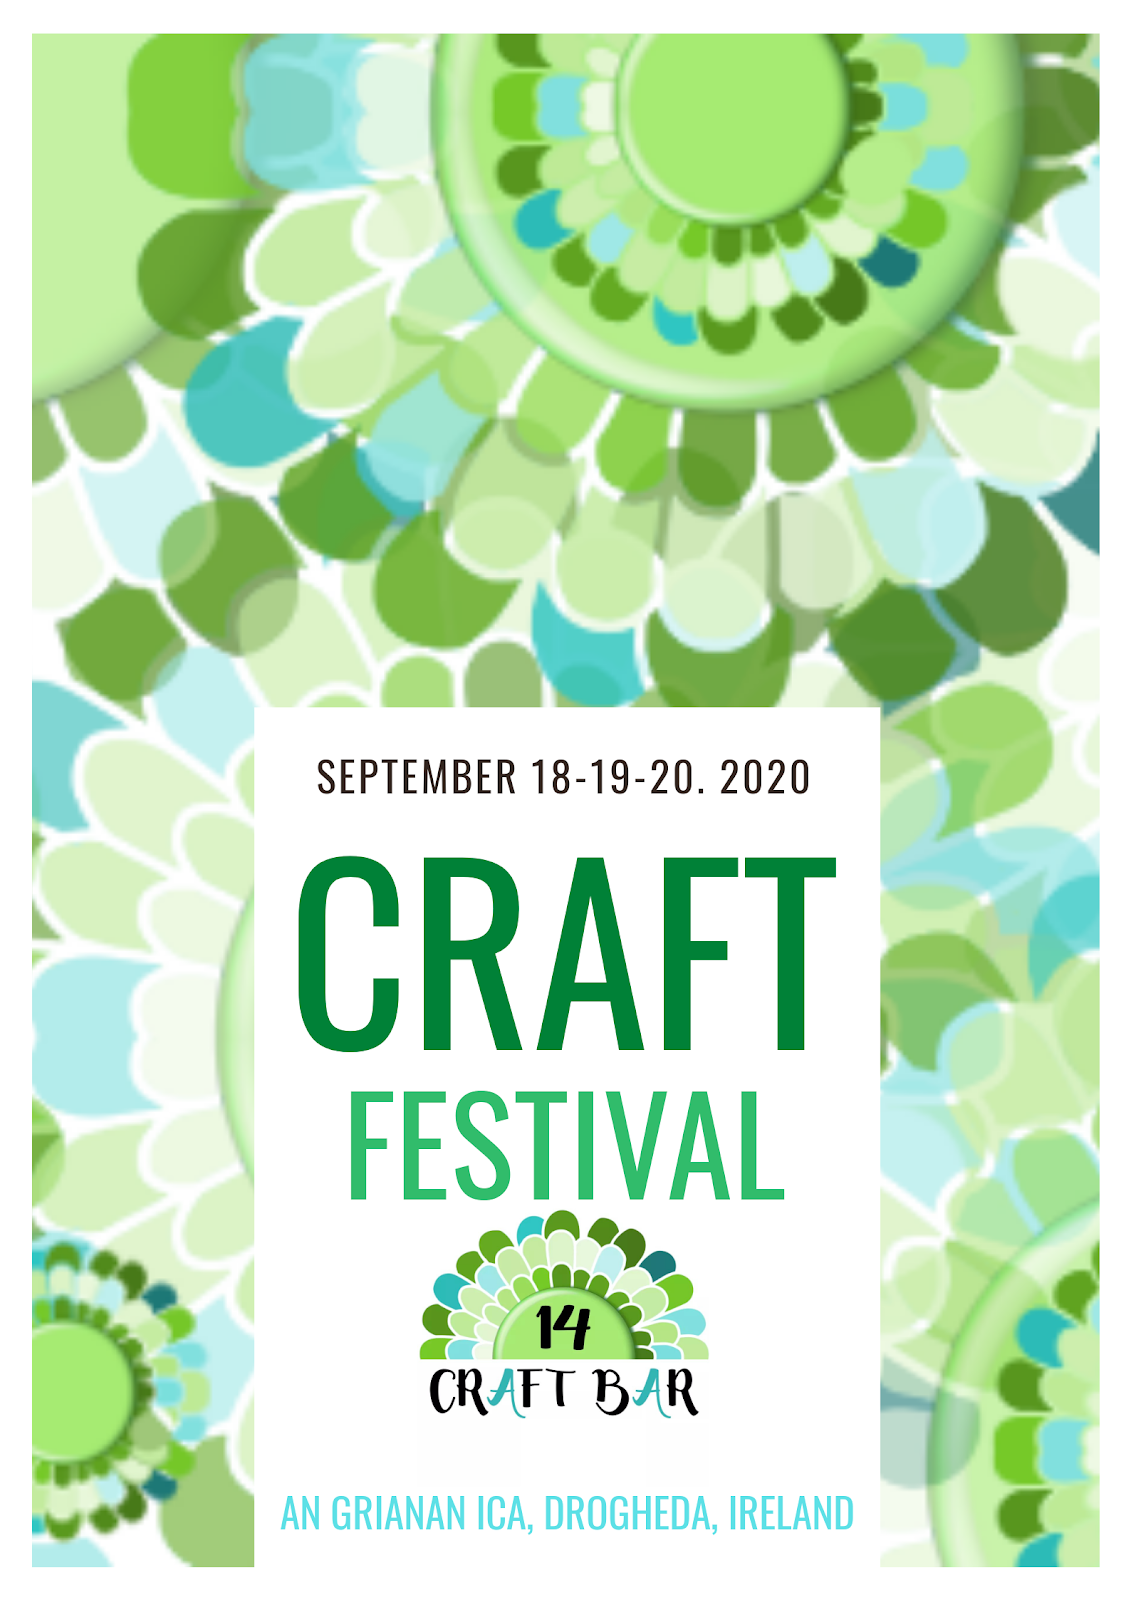 Craft Festival 2020